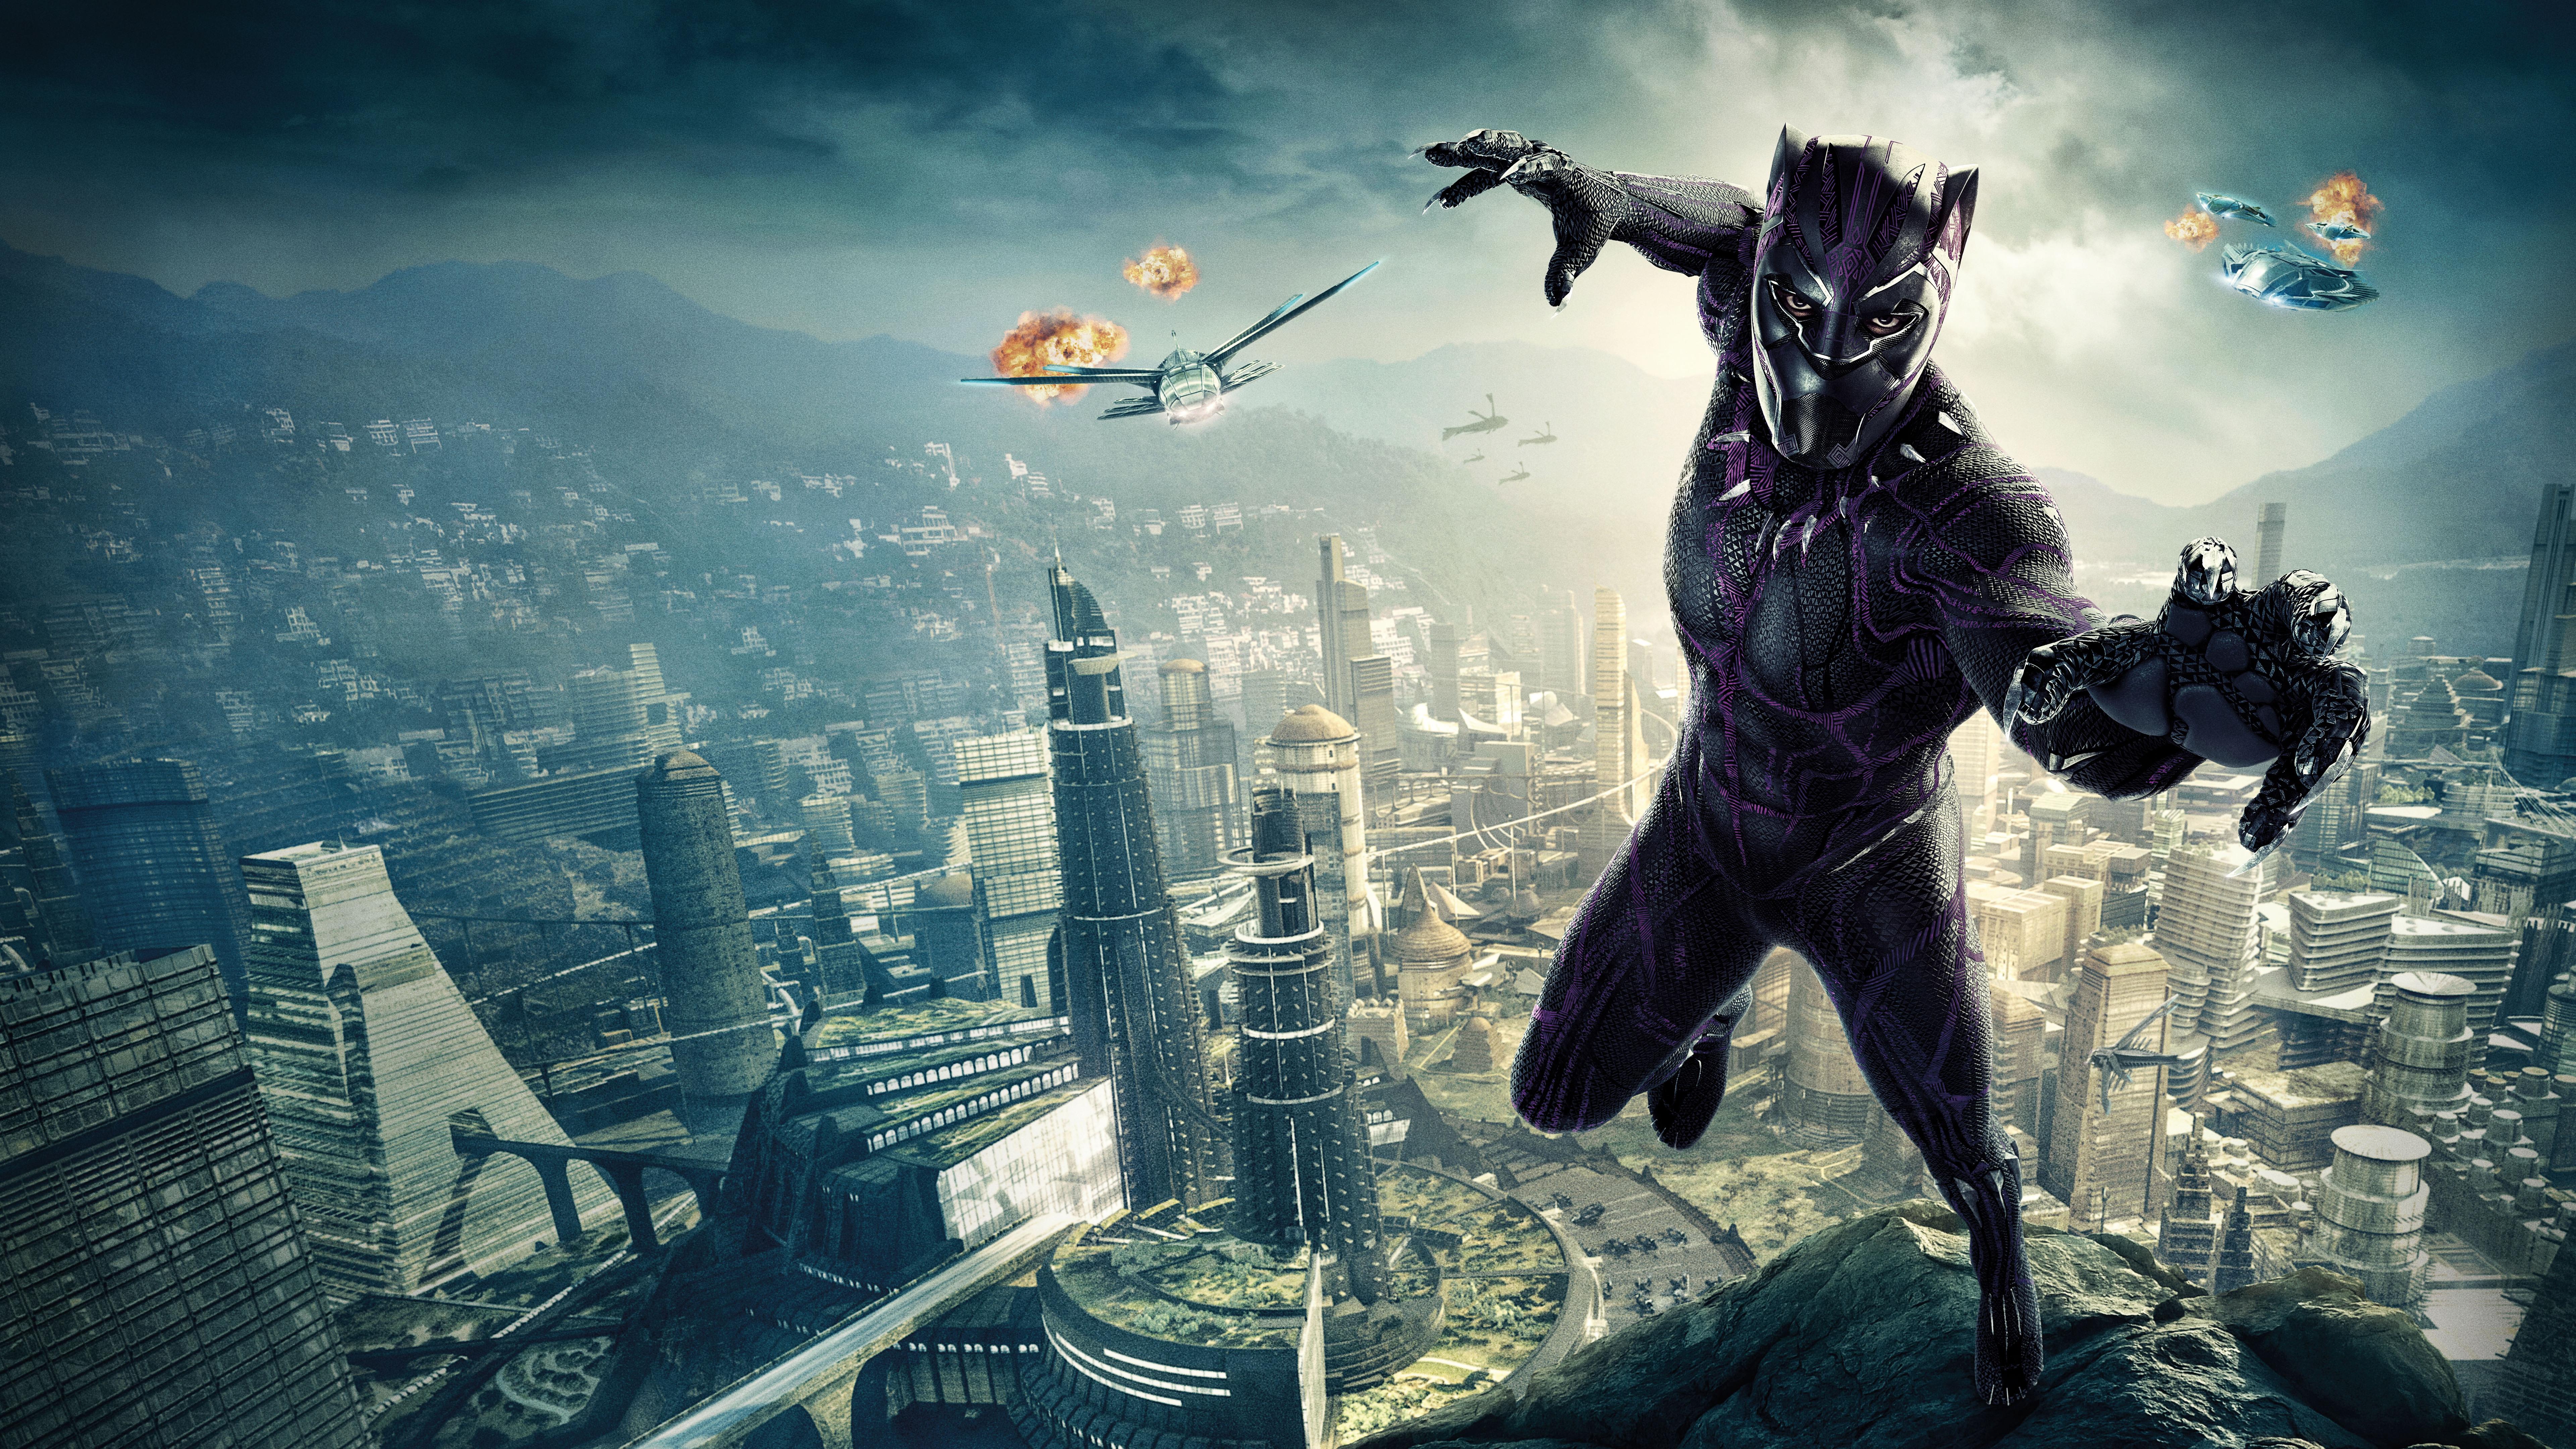 7680x4320 Black Panther 10k Poster 8k Hd 4k Wallpapers